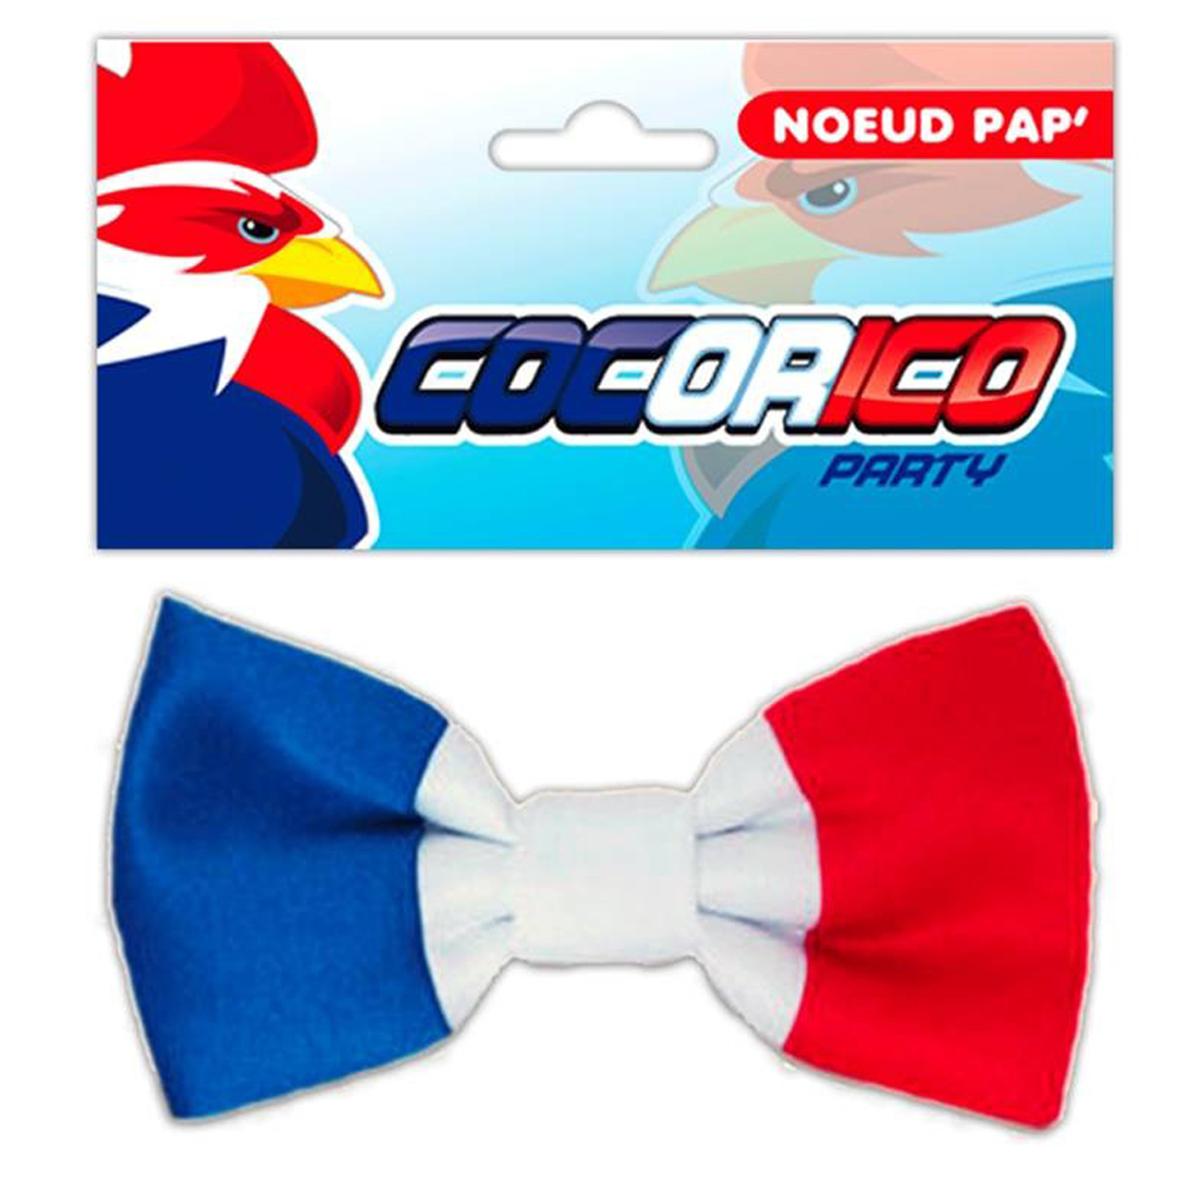 Noeud papillon \'France Cocorico\' tricolore - [N4226]